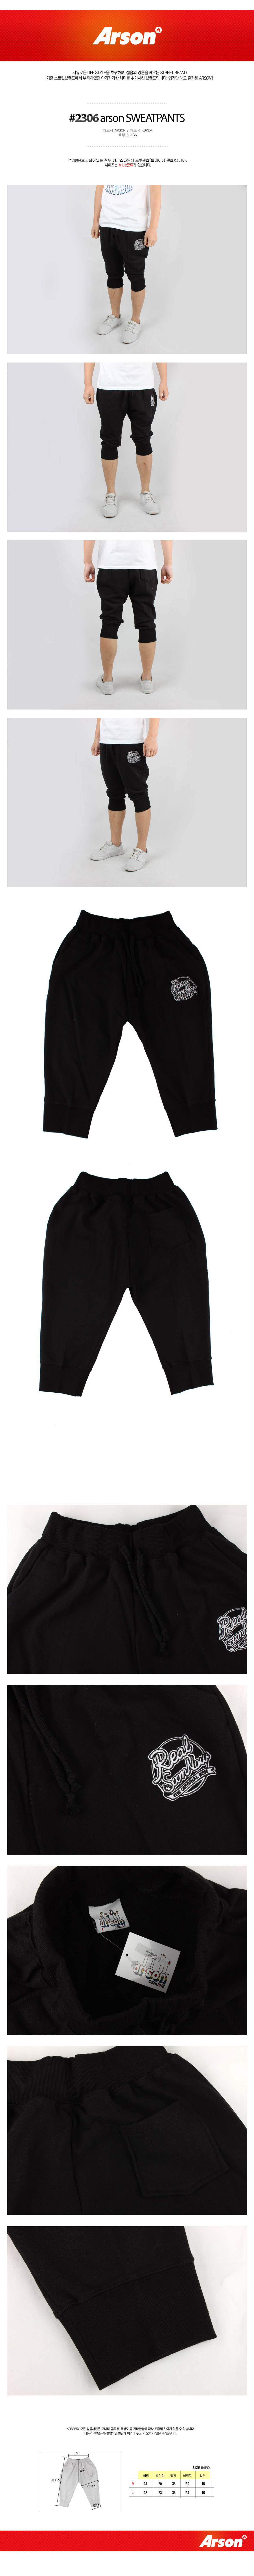 [ ARSON ] [纵火] TP2306 训练长裤 sweatpants